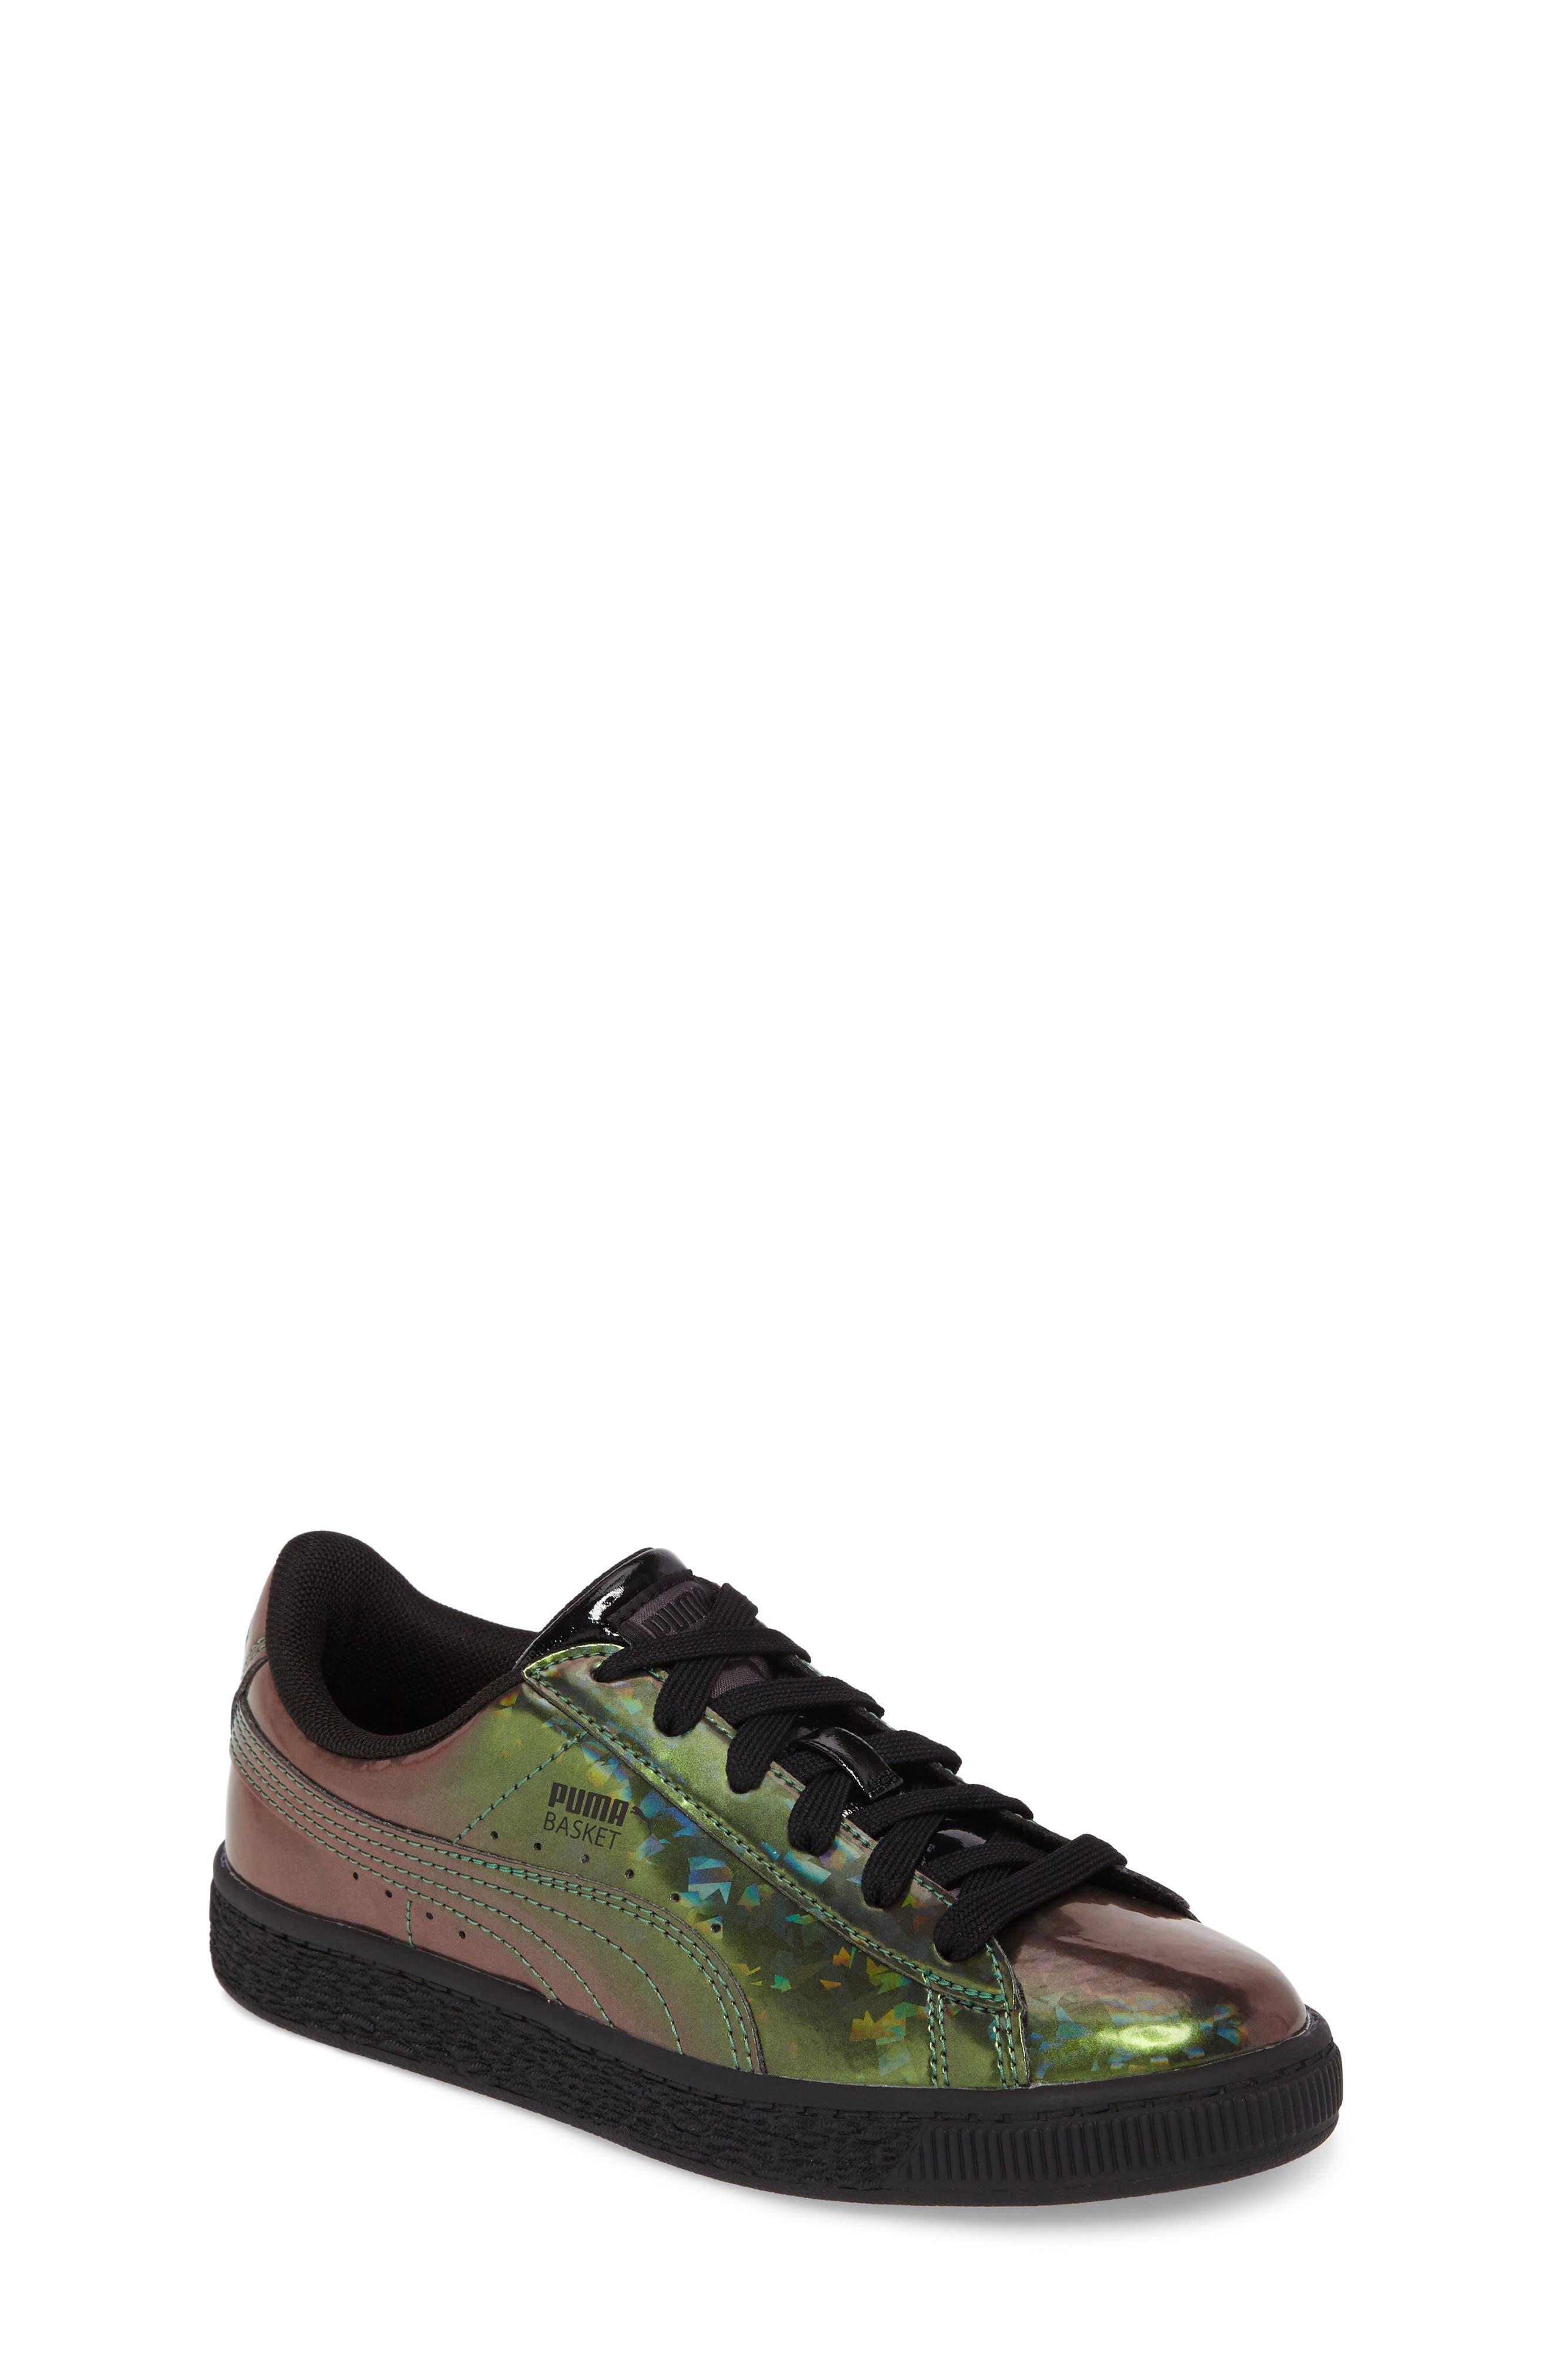 Basket Classic Holo PS Sneaker,                         Main,                         color, Black/ Black